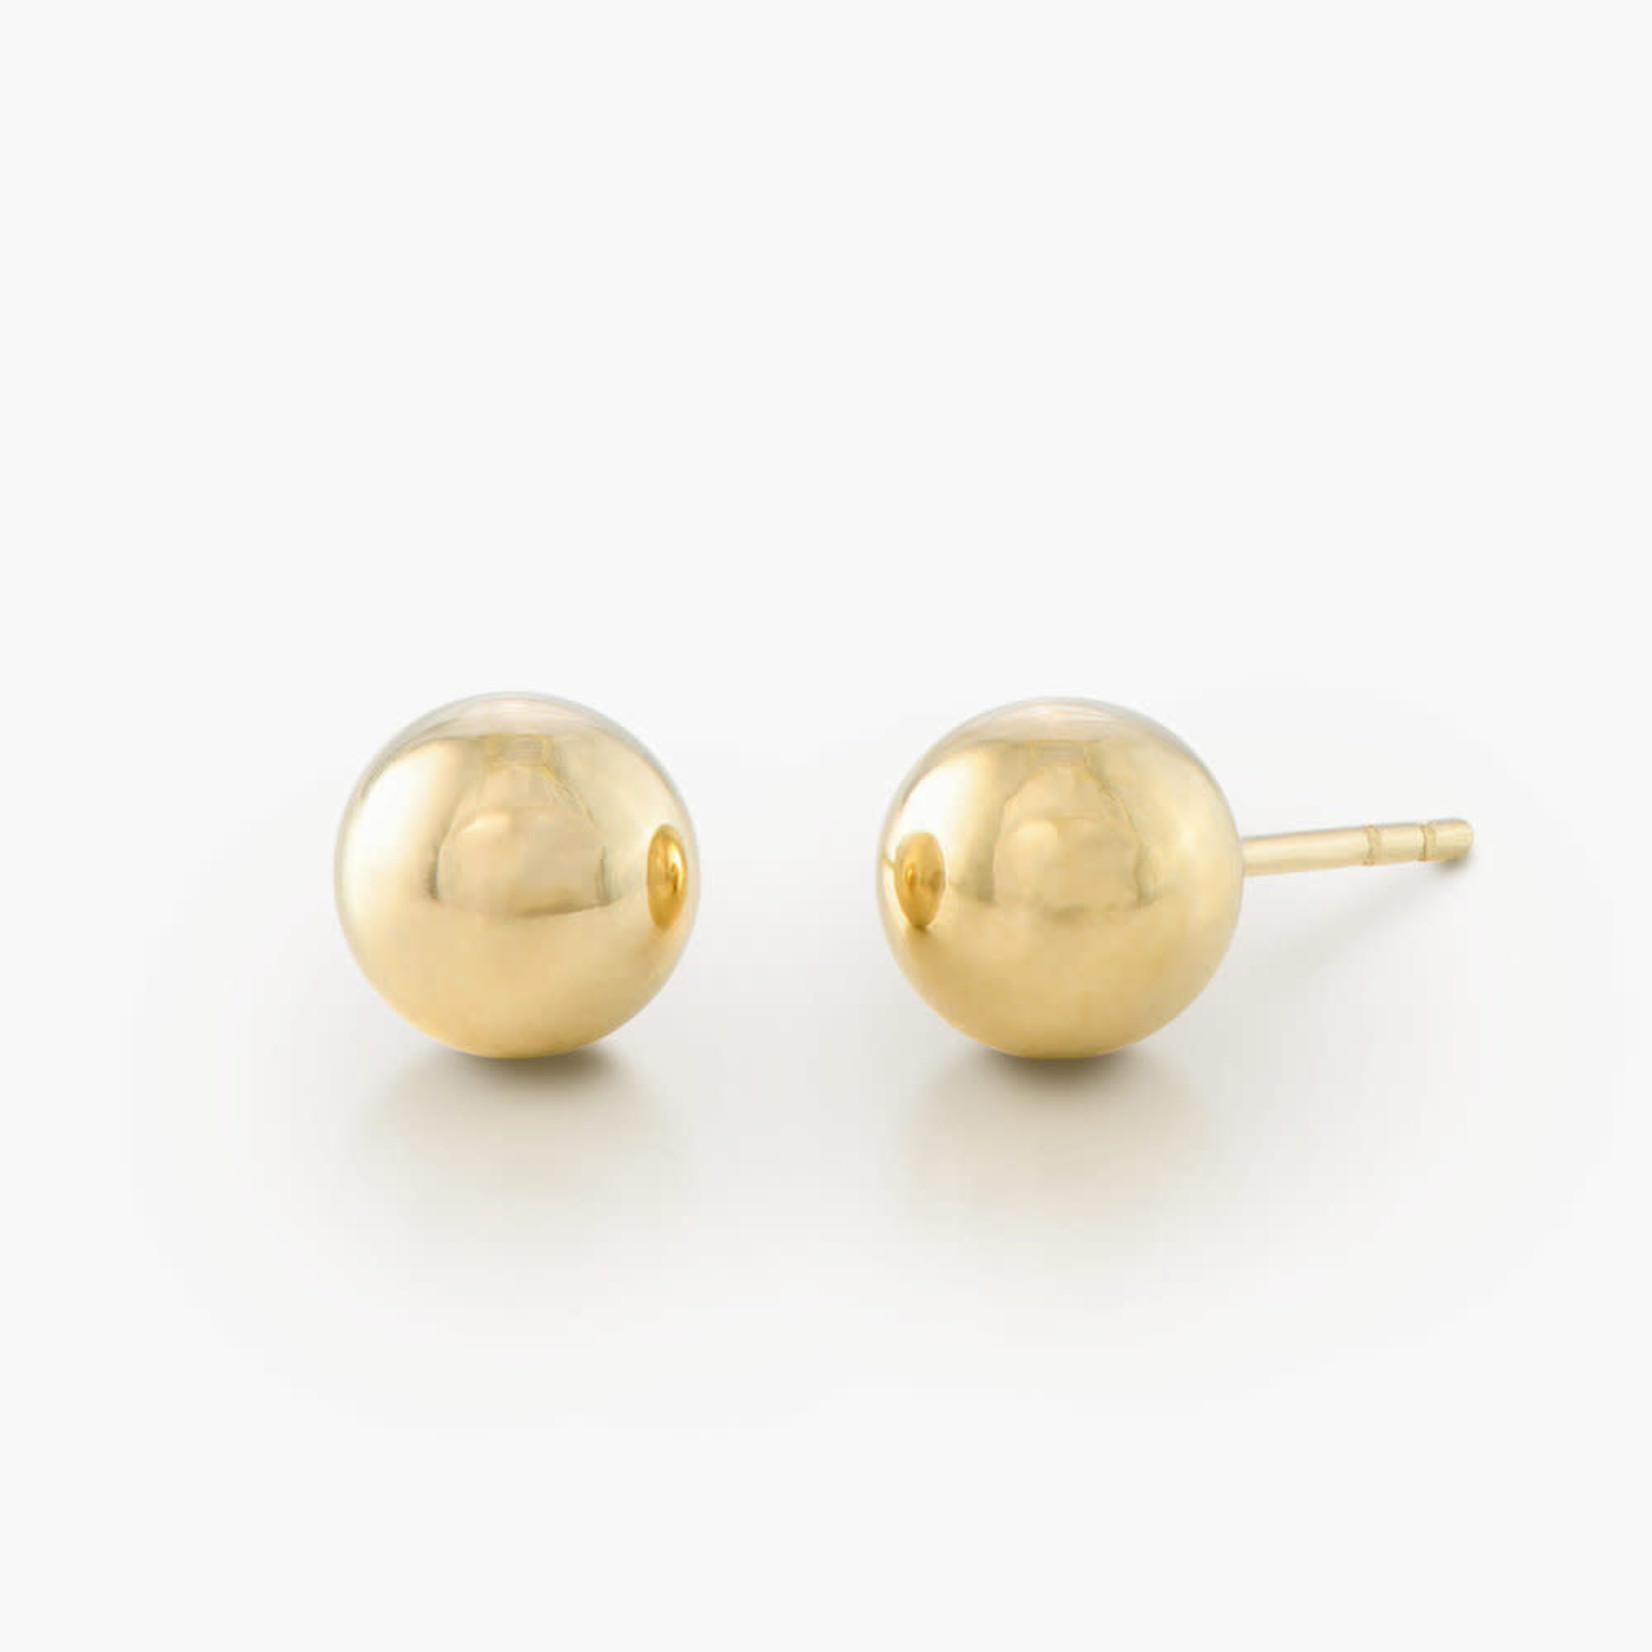 18K & Sterling Silver 8mm Round Ball Stud Earrings